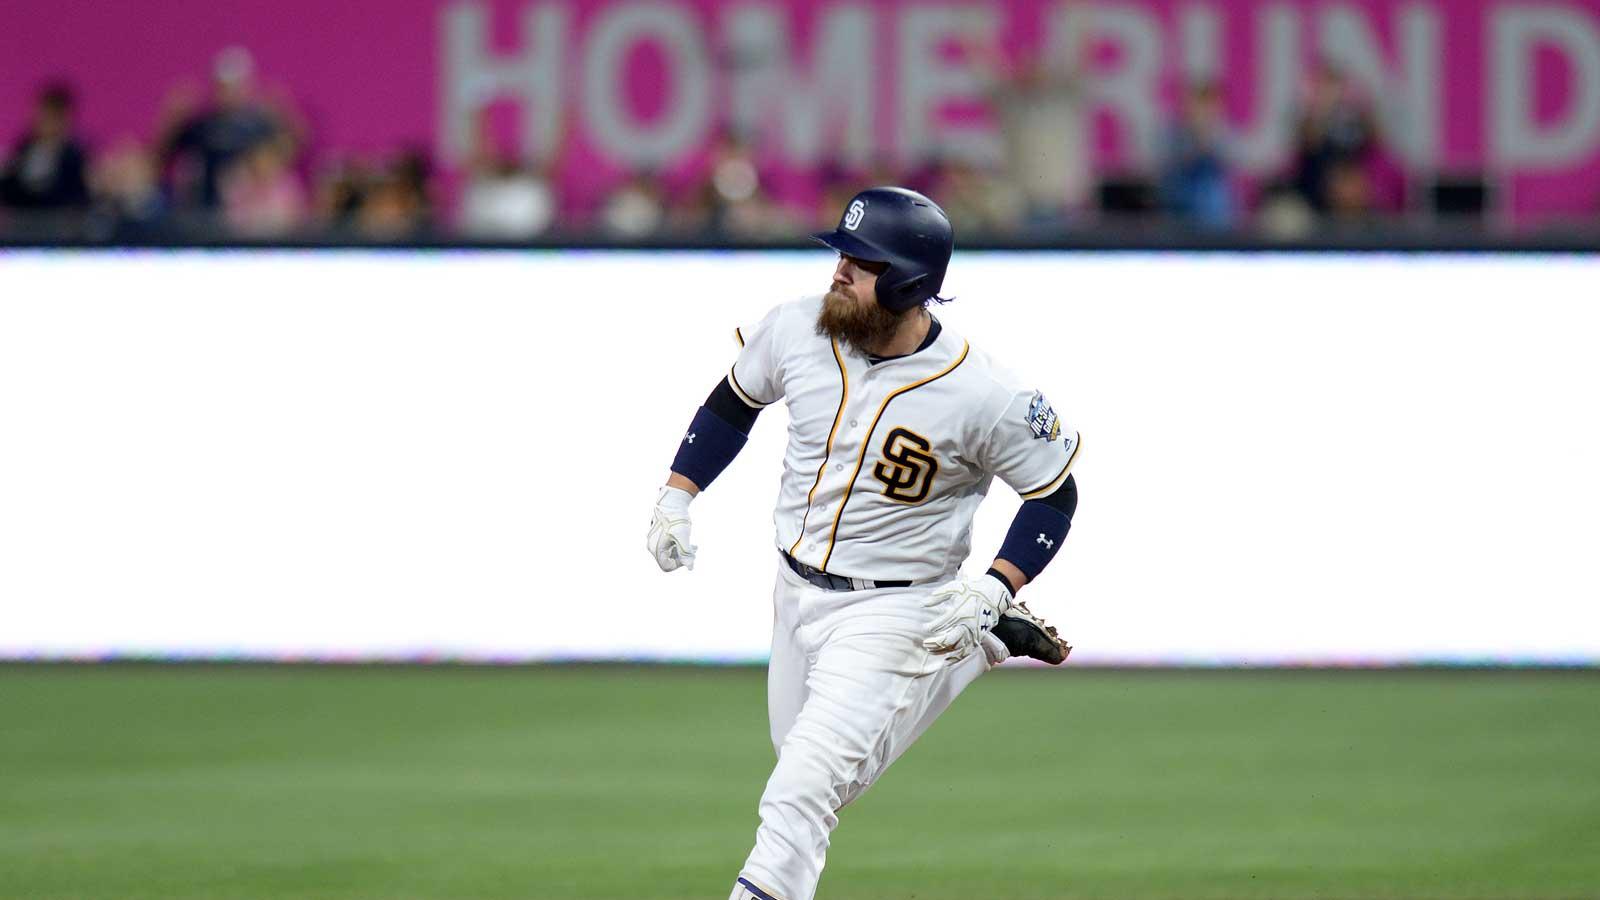 Padres top Pirates 5-4 behind 3 home runs